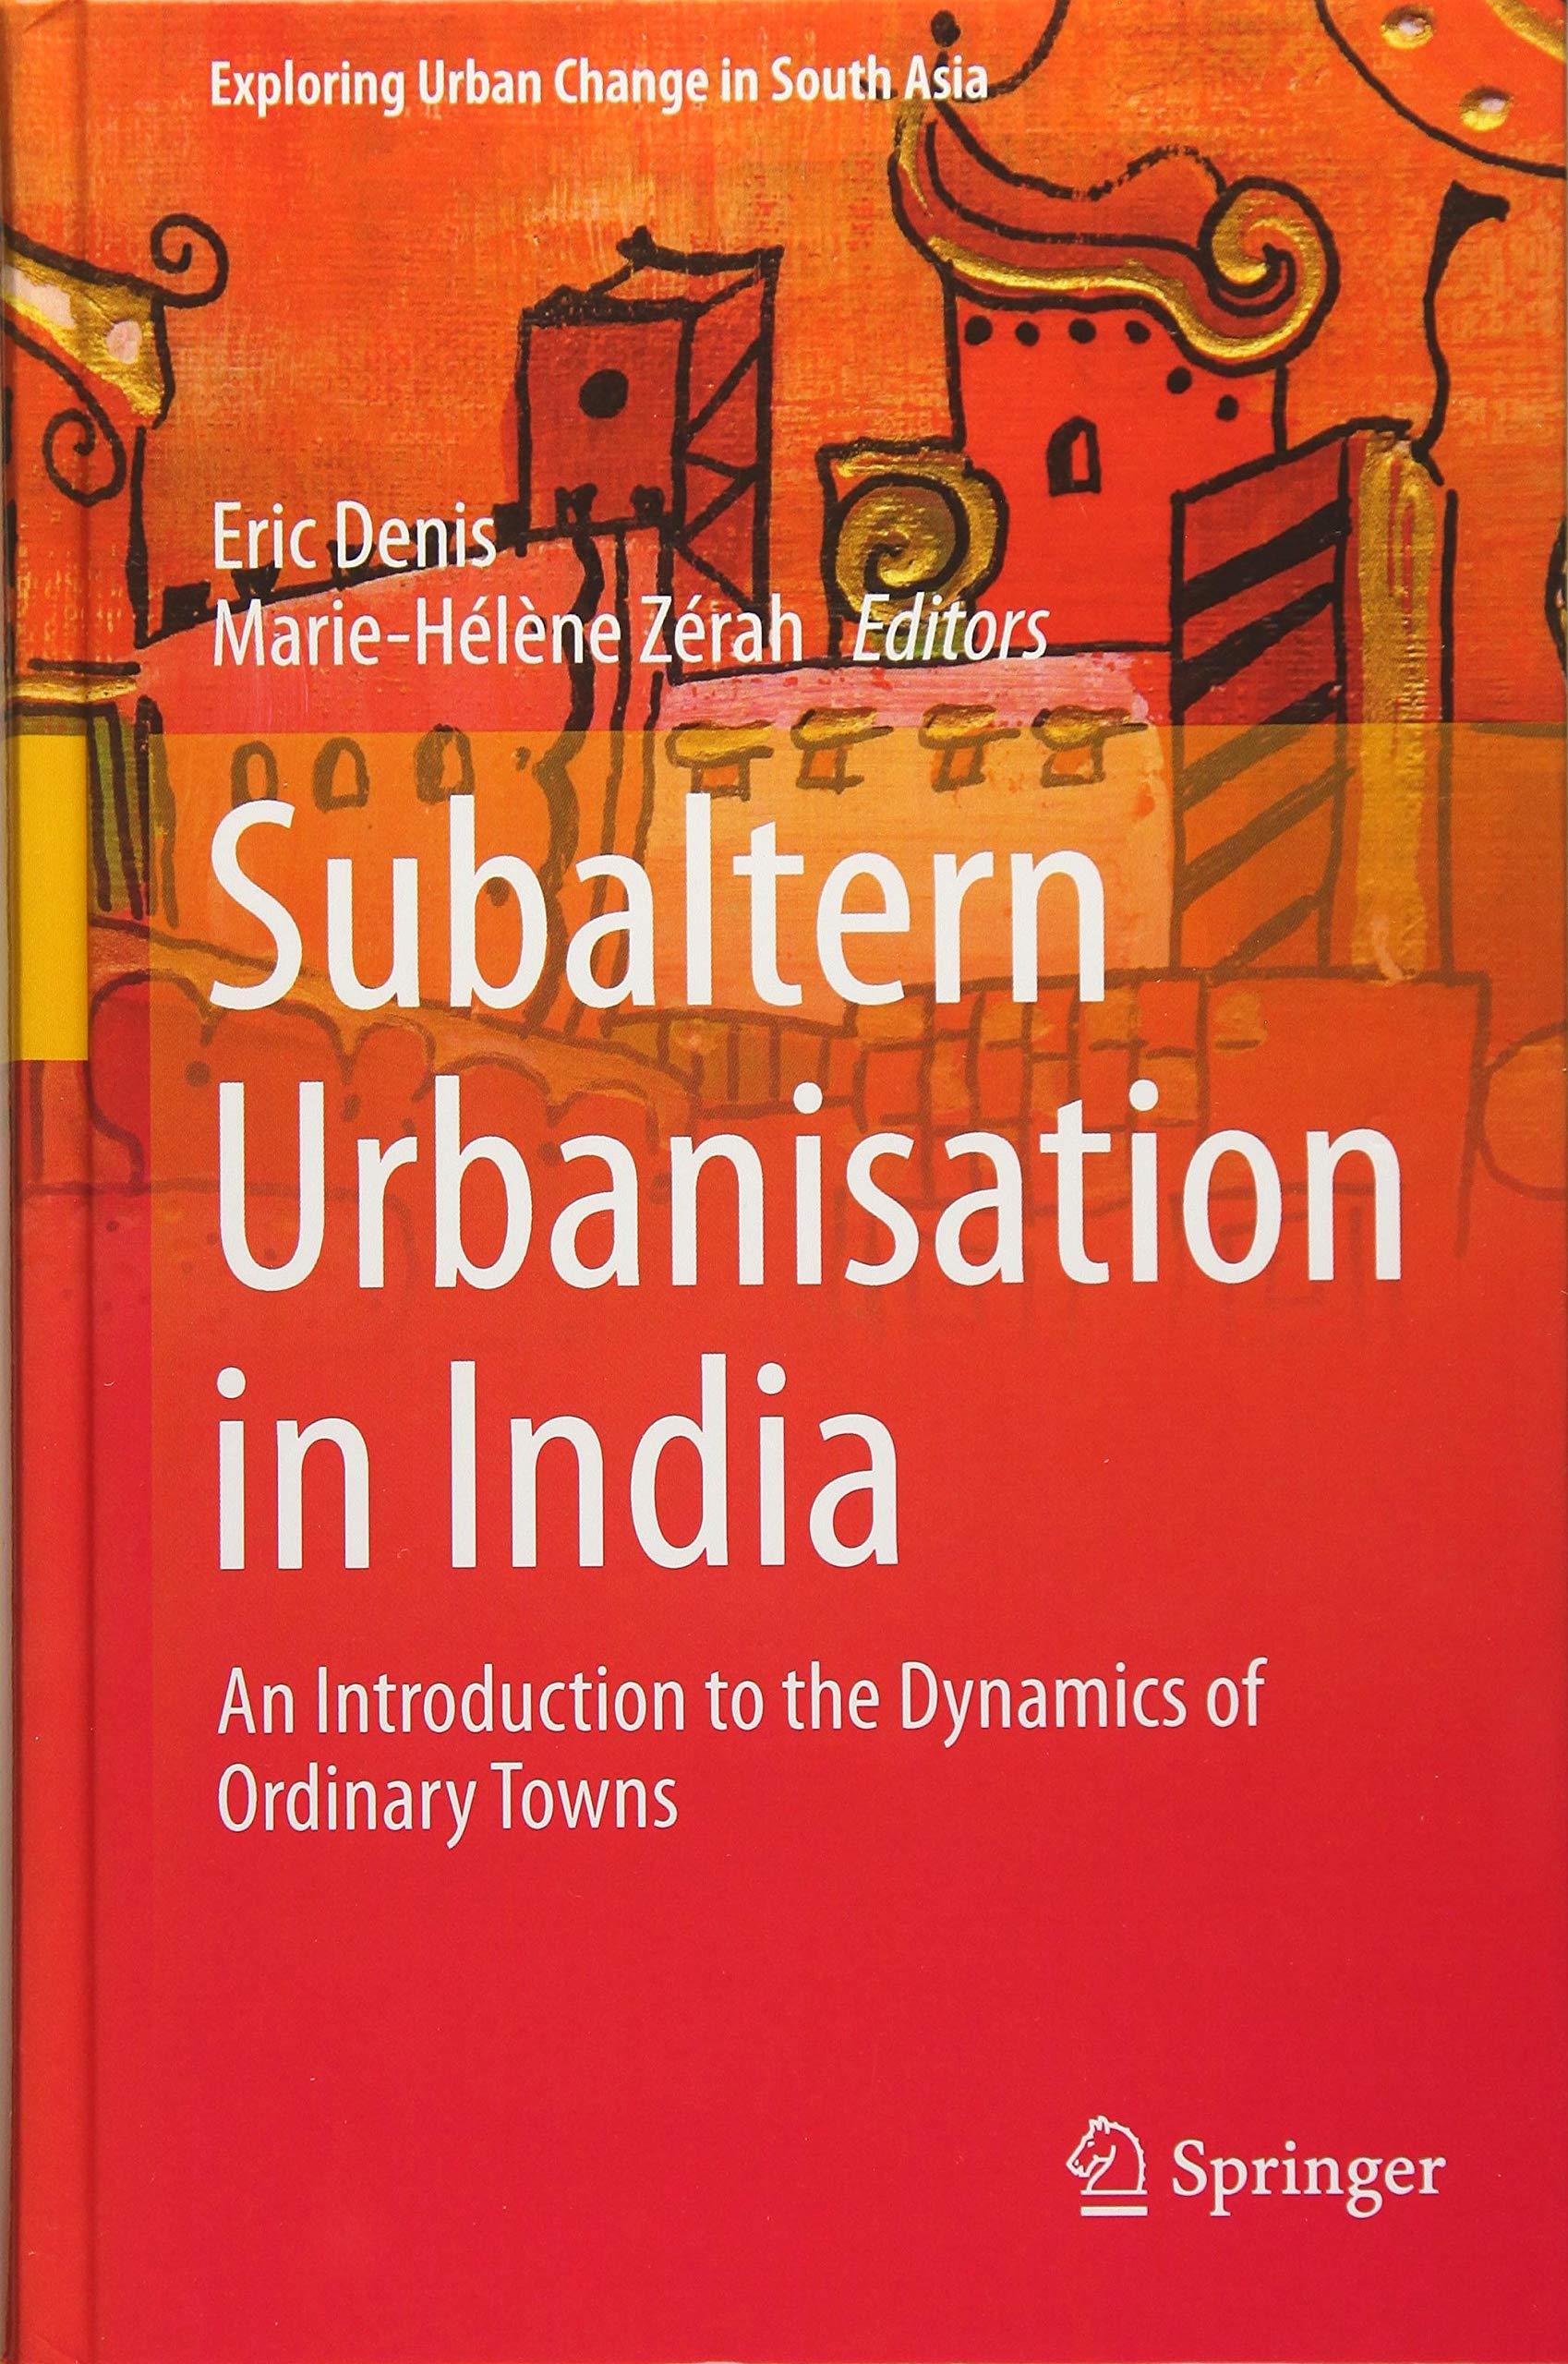 Subaltern Urbanisation in India book cover